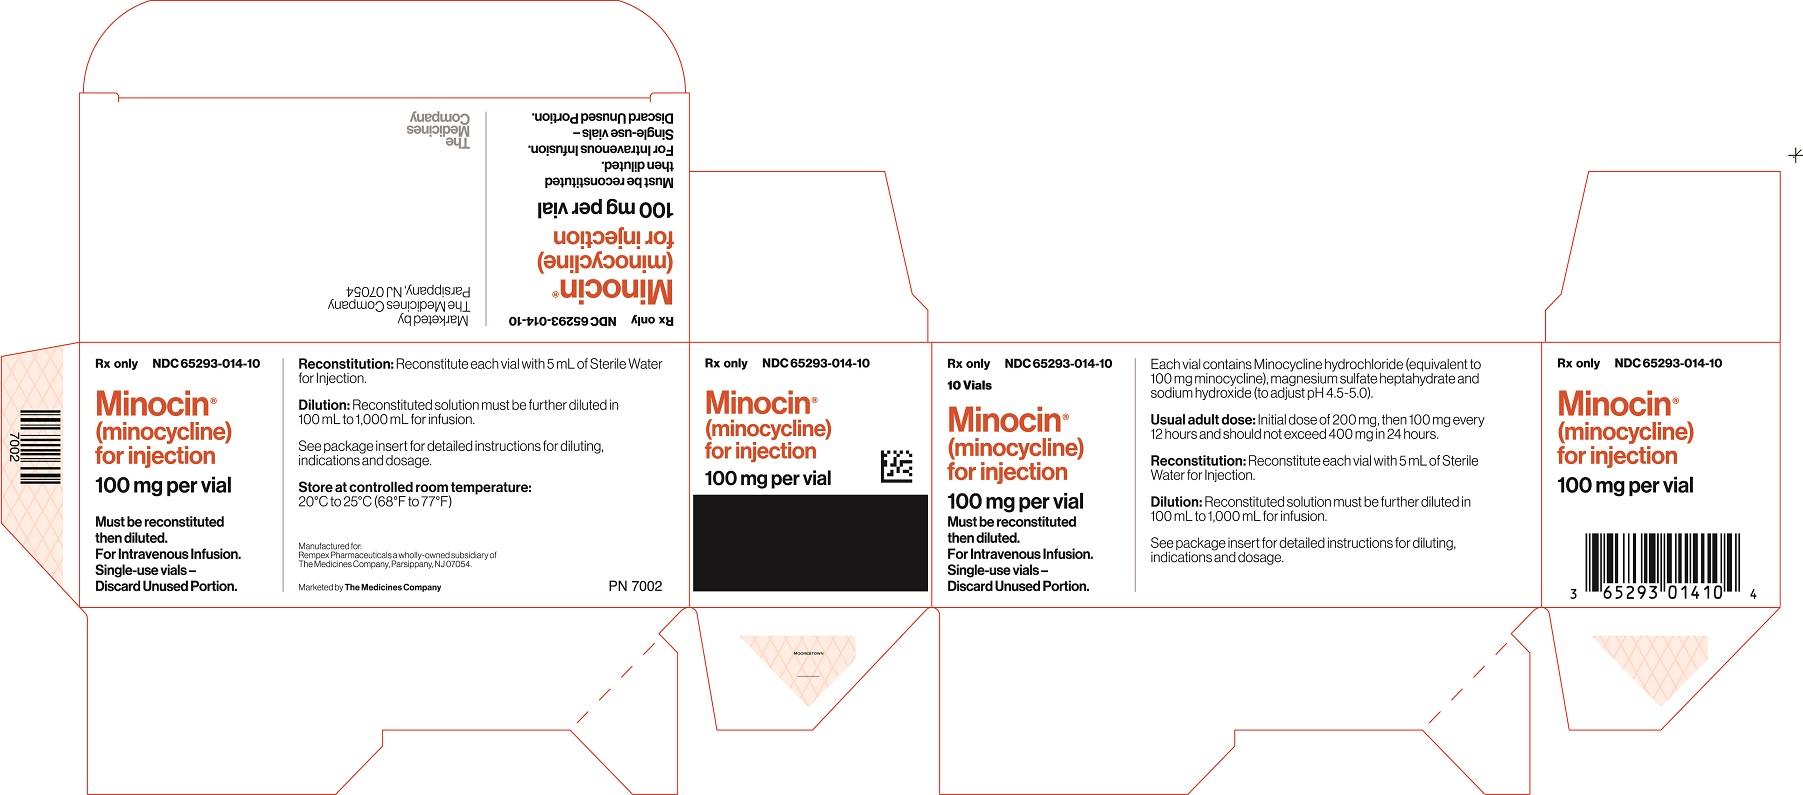 Minocin (minocycline) for injection 100 mg carton